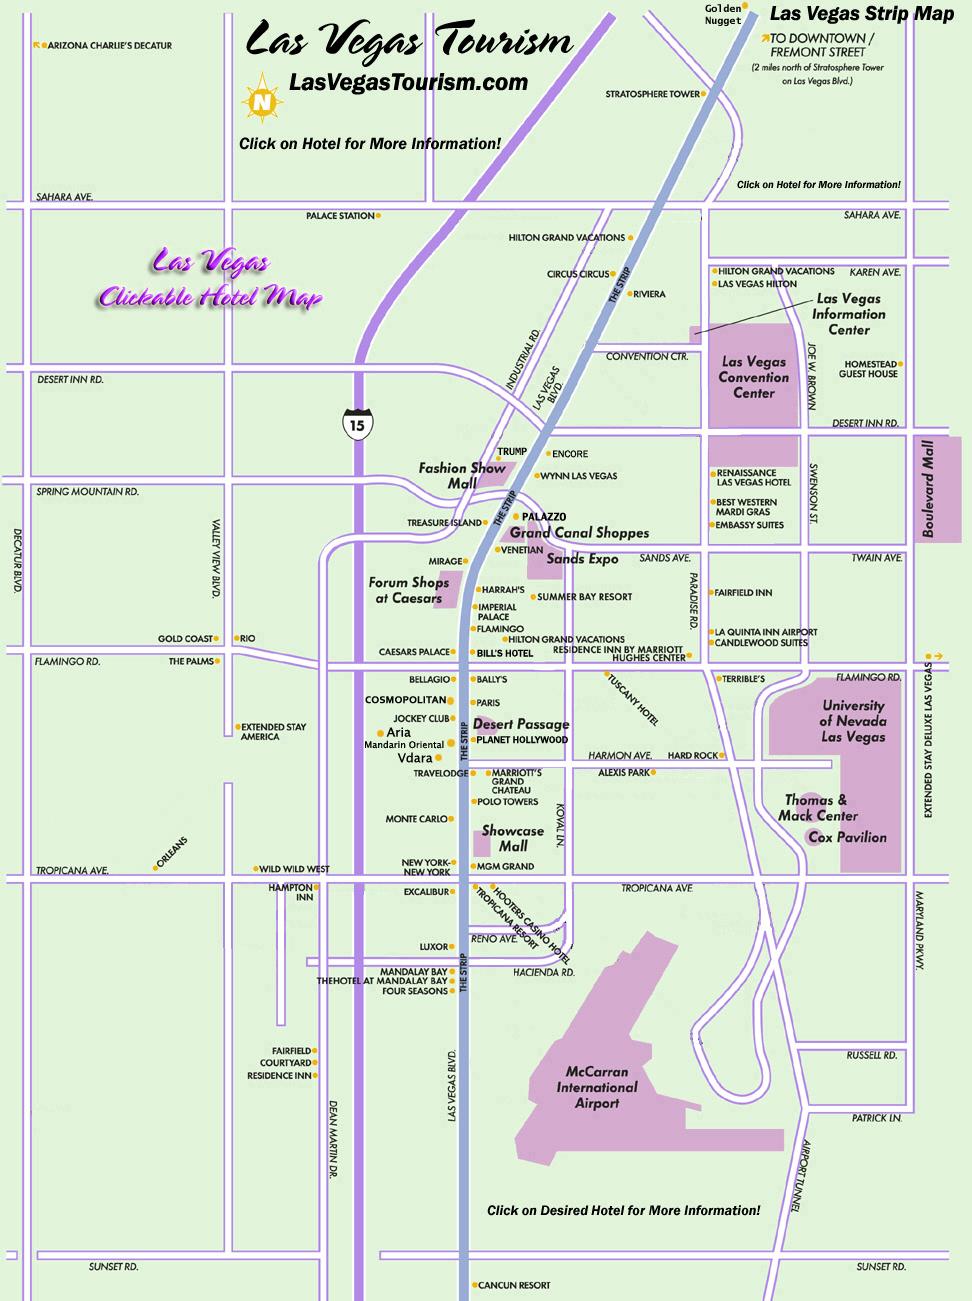 Las Vegas Map, Official Site - Las Vegas Strip Map - Map Of Las Vegas Strip Hotels Printable